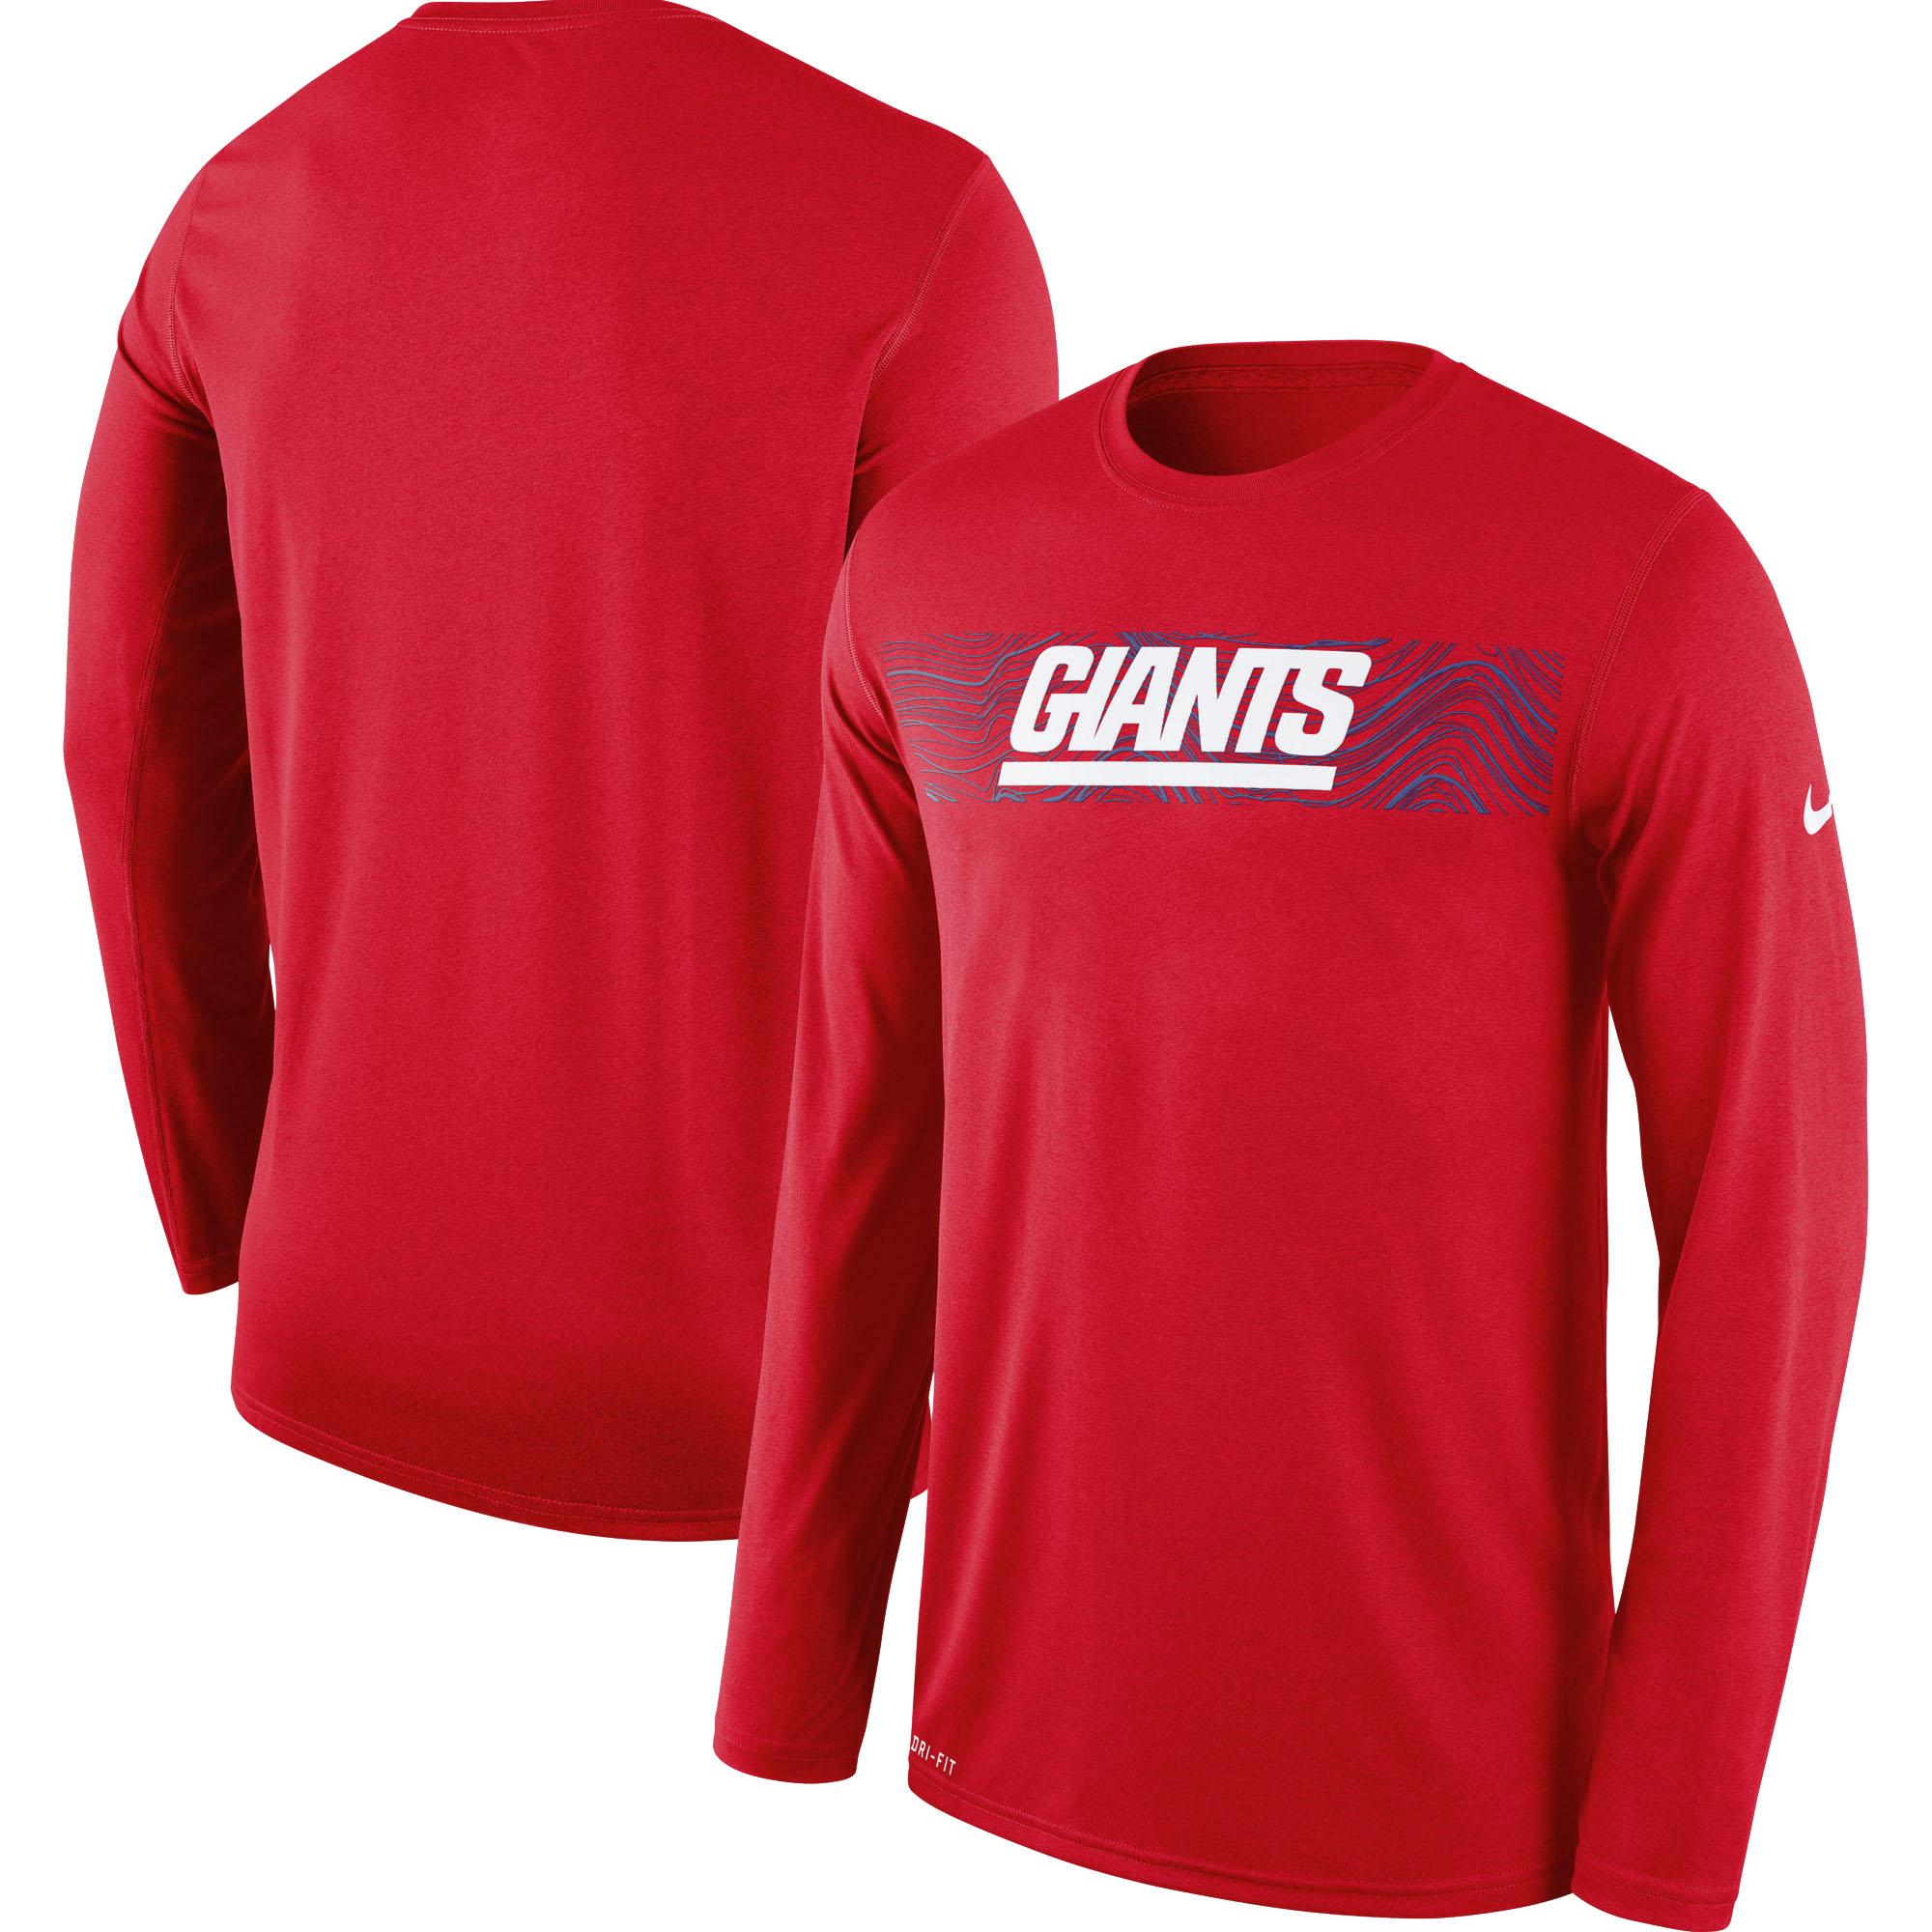 New York Giants Nike Sideline Seismic Legend Long Sleeve T-Shirt - Red